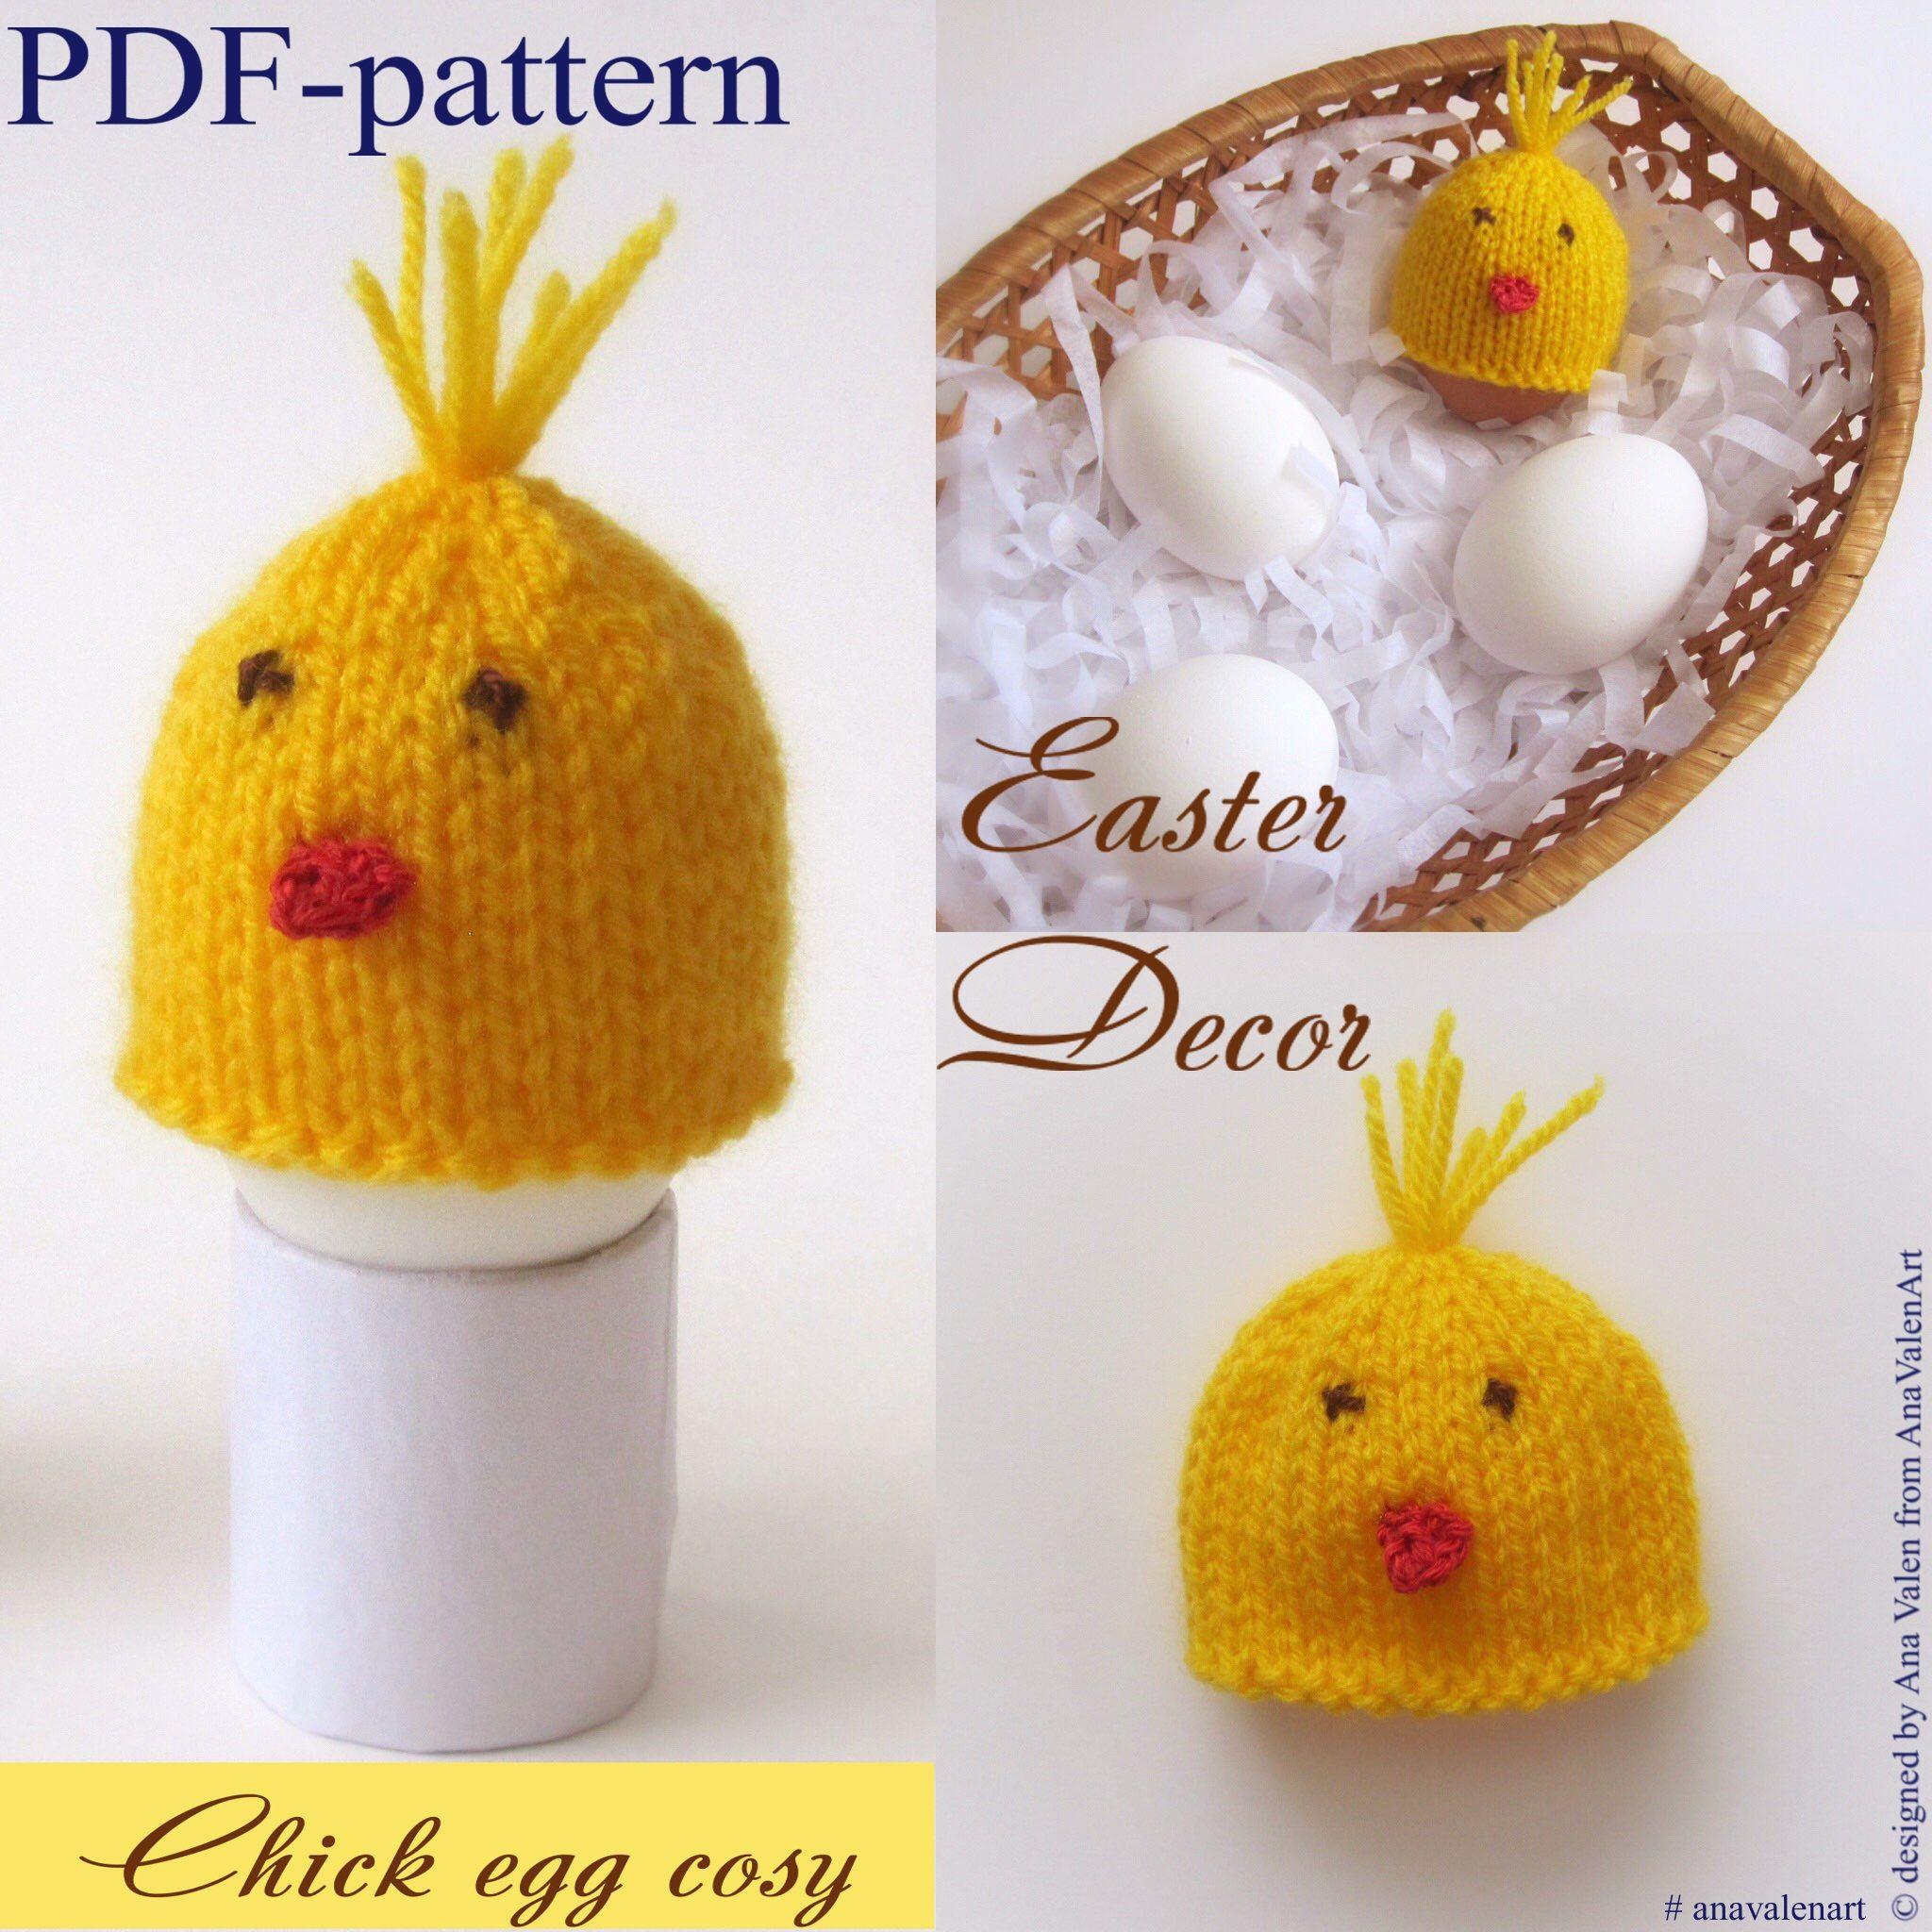 PDF-pattern Chick egg cosy Knitting Pattern Egg cozy Easter decor ...